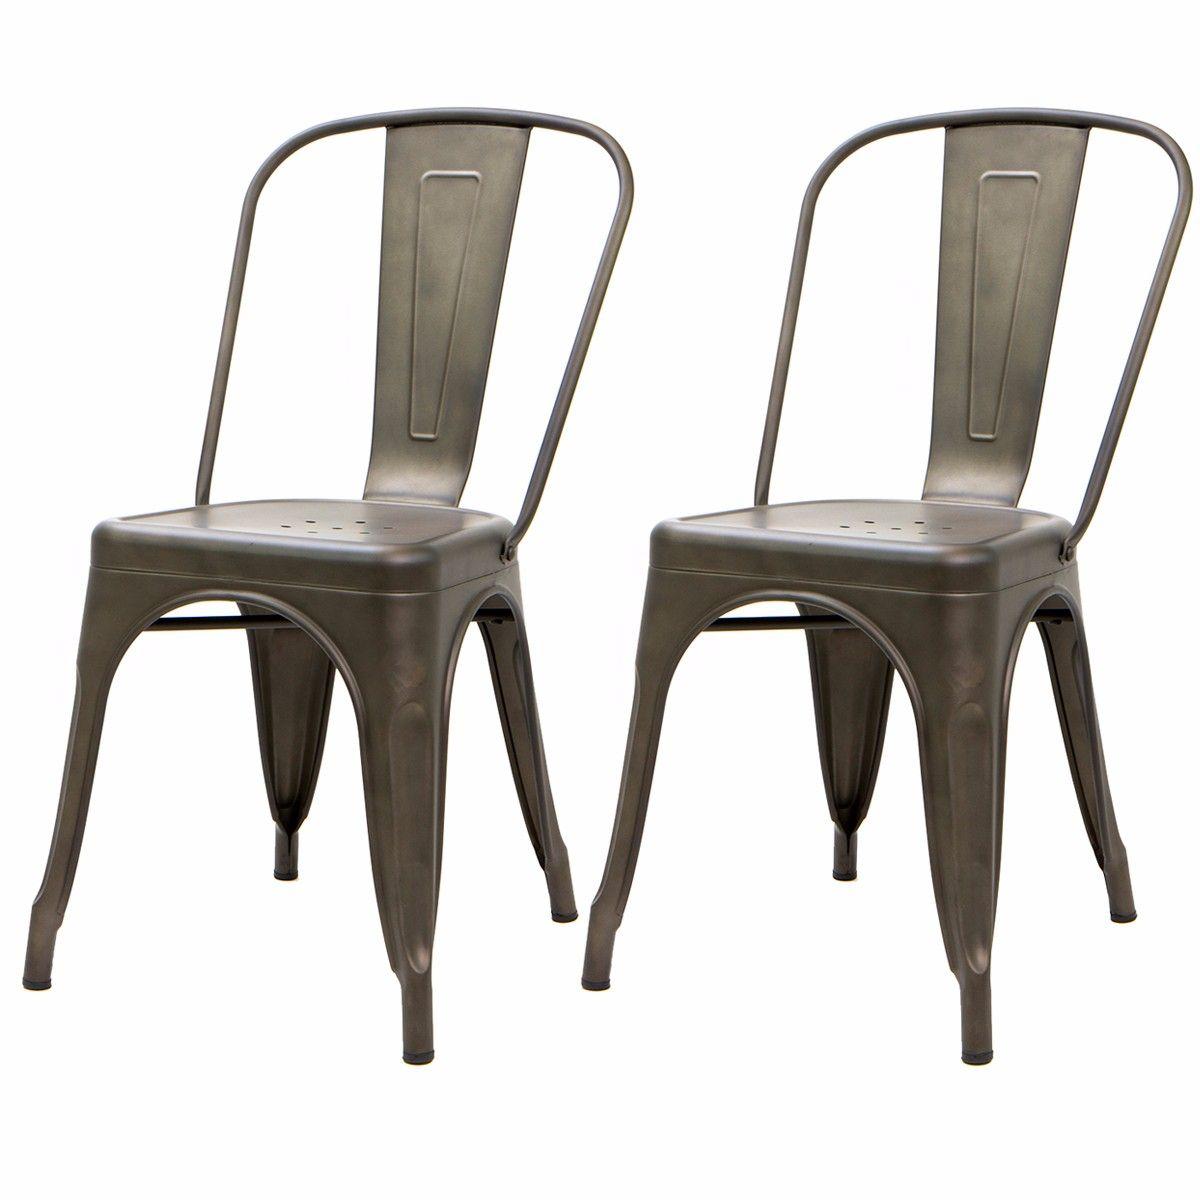 Guns On Kitchen Table: 2PC Bistro Bar Pub Dining Promenade Vintage Side Chair